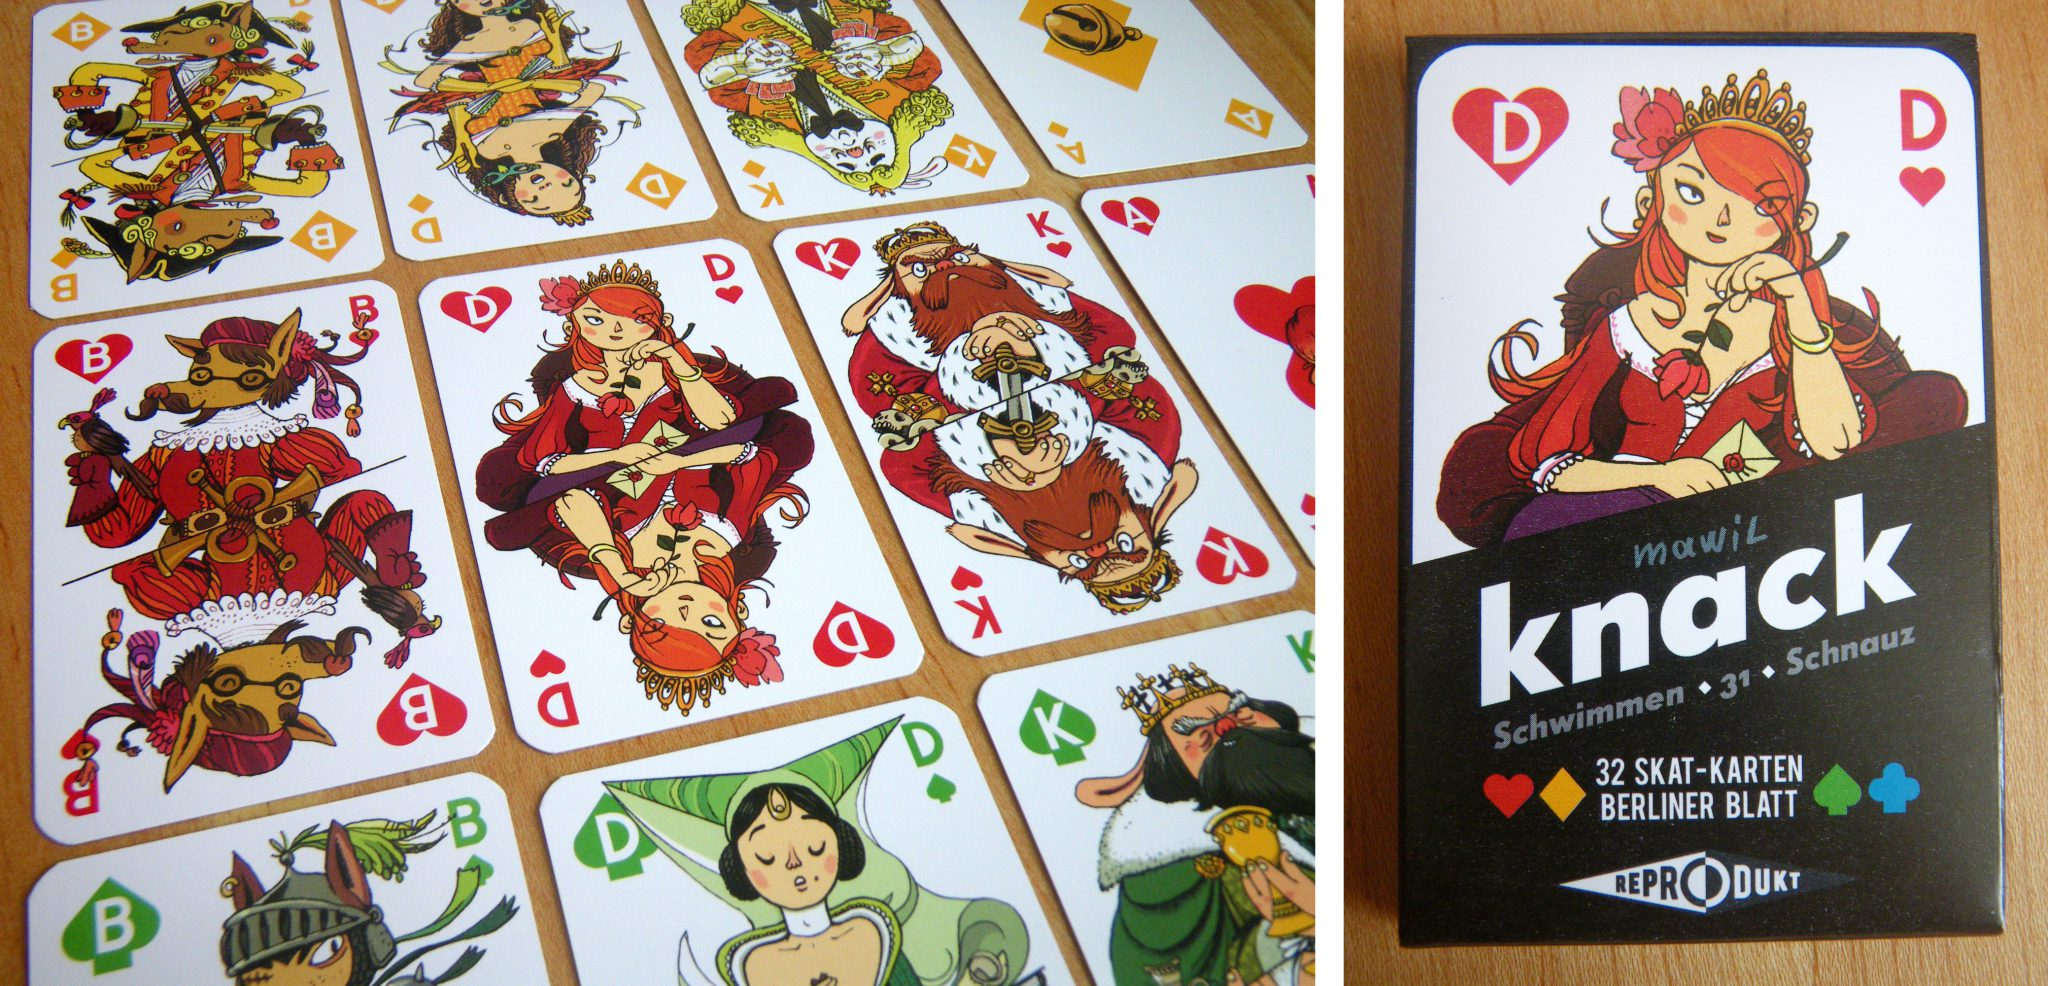 Kartenspiel Knack Spielen